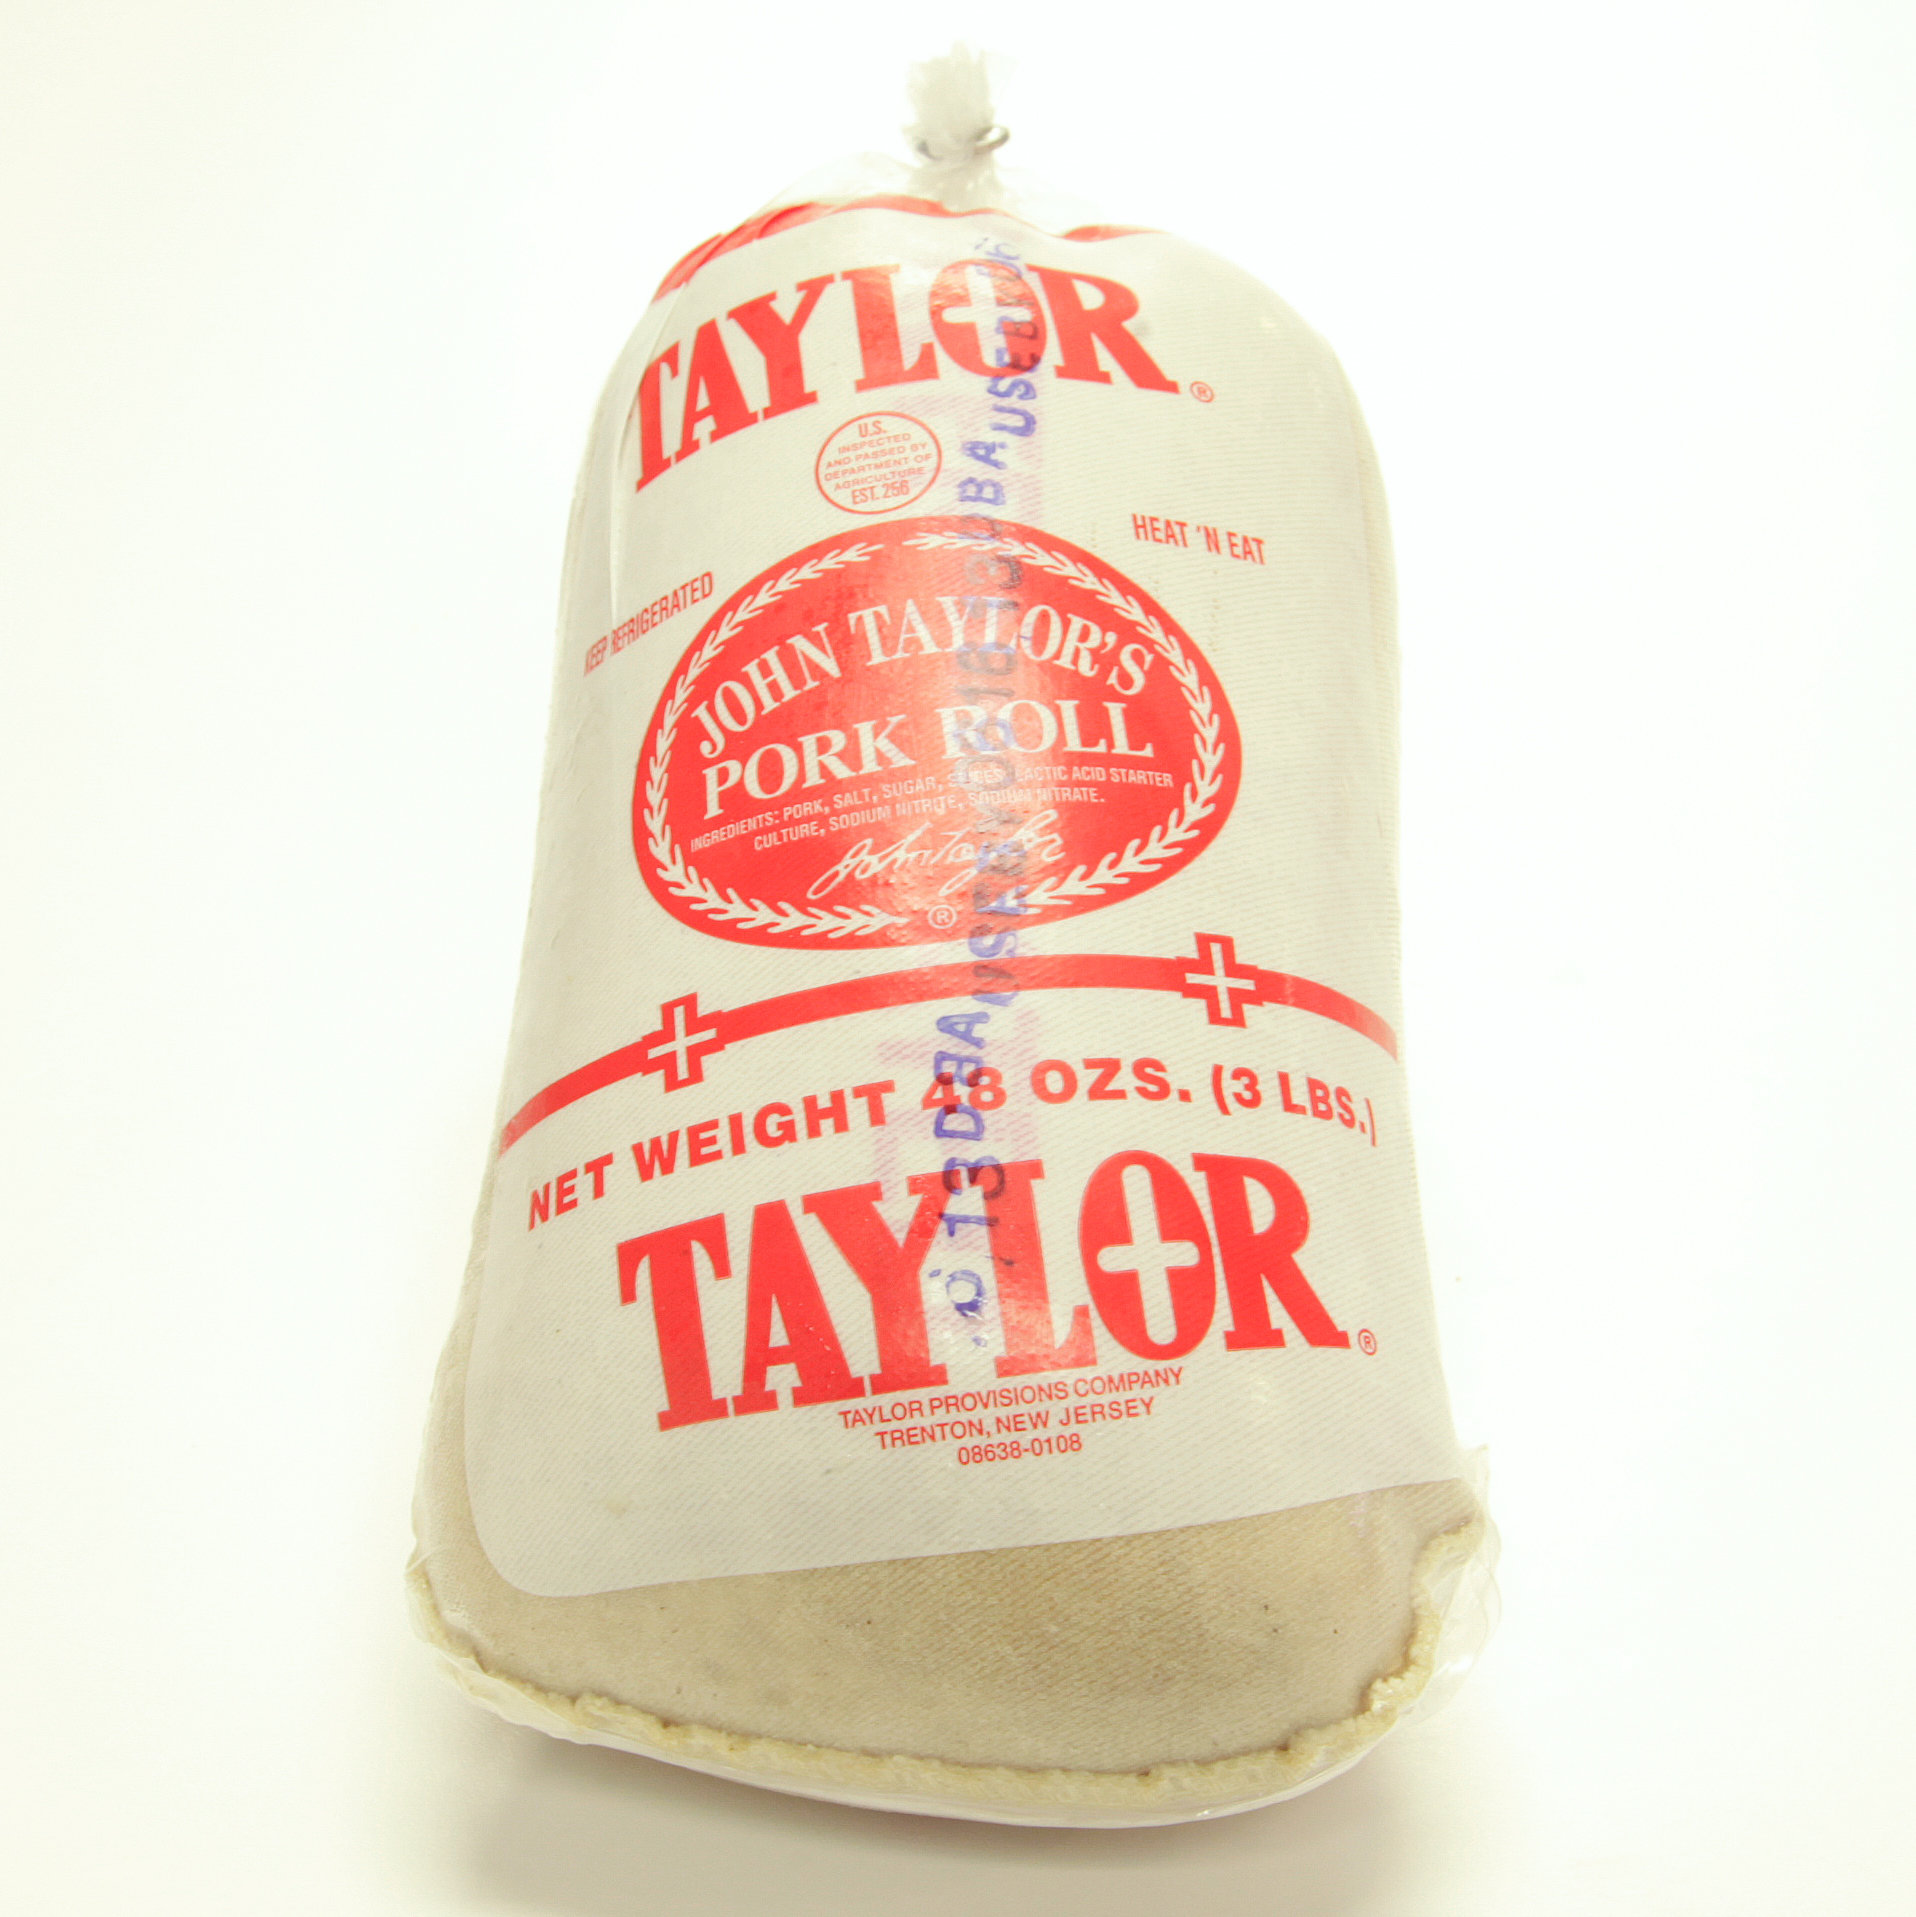 Taylor, Pork Roll, 3 lbs. 00132